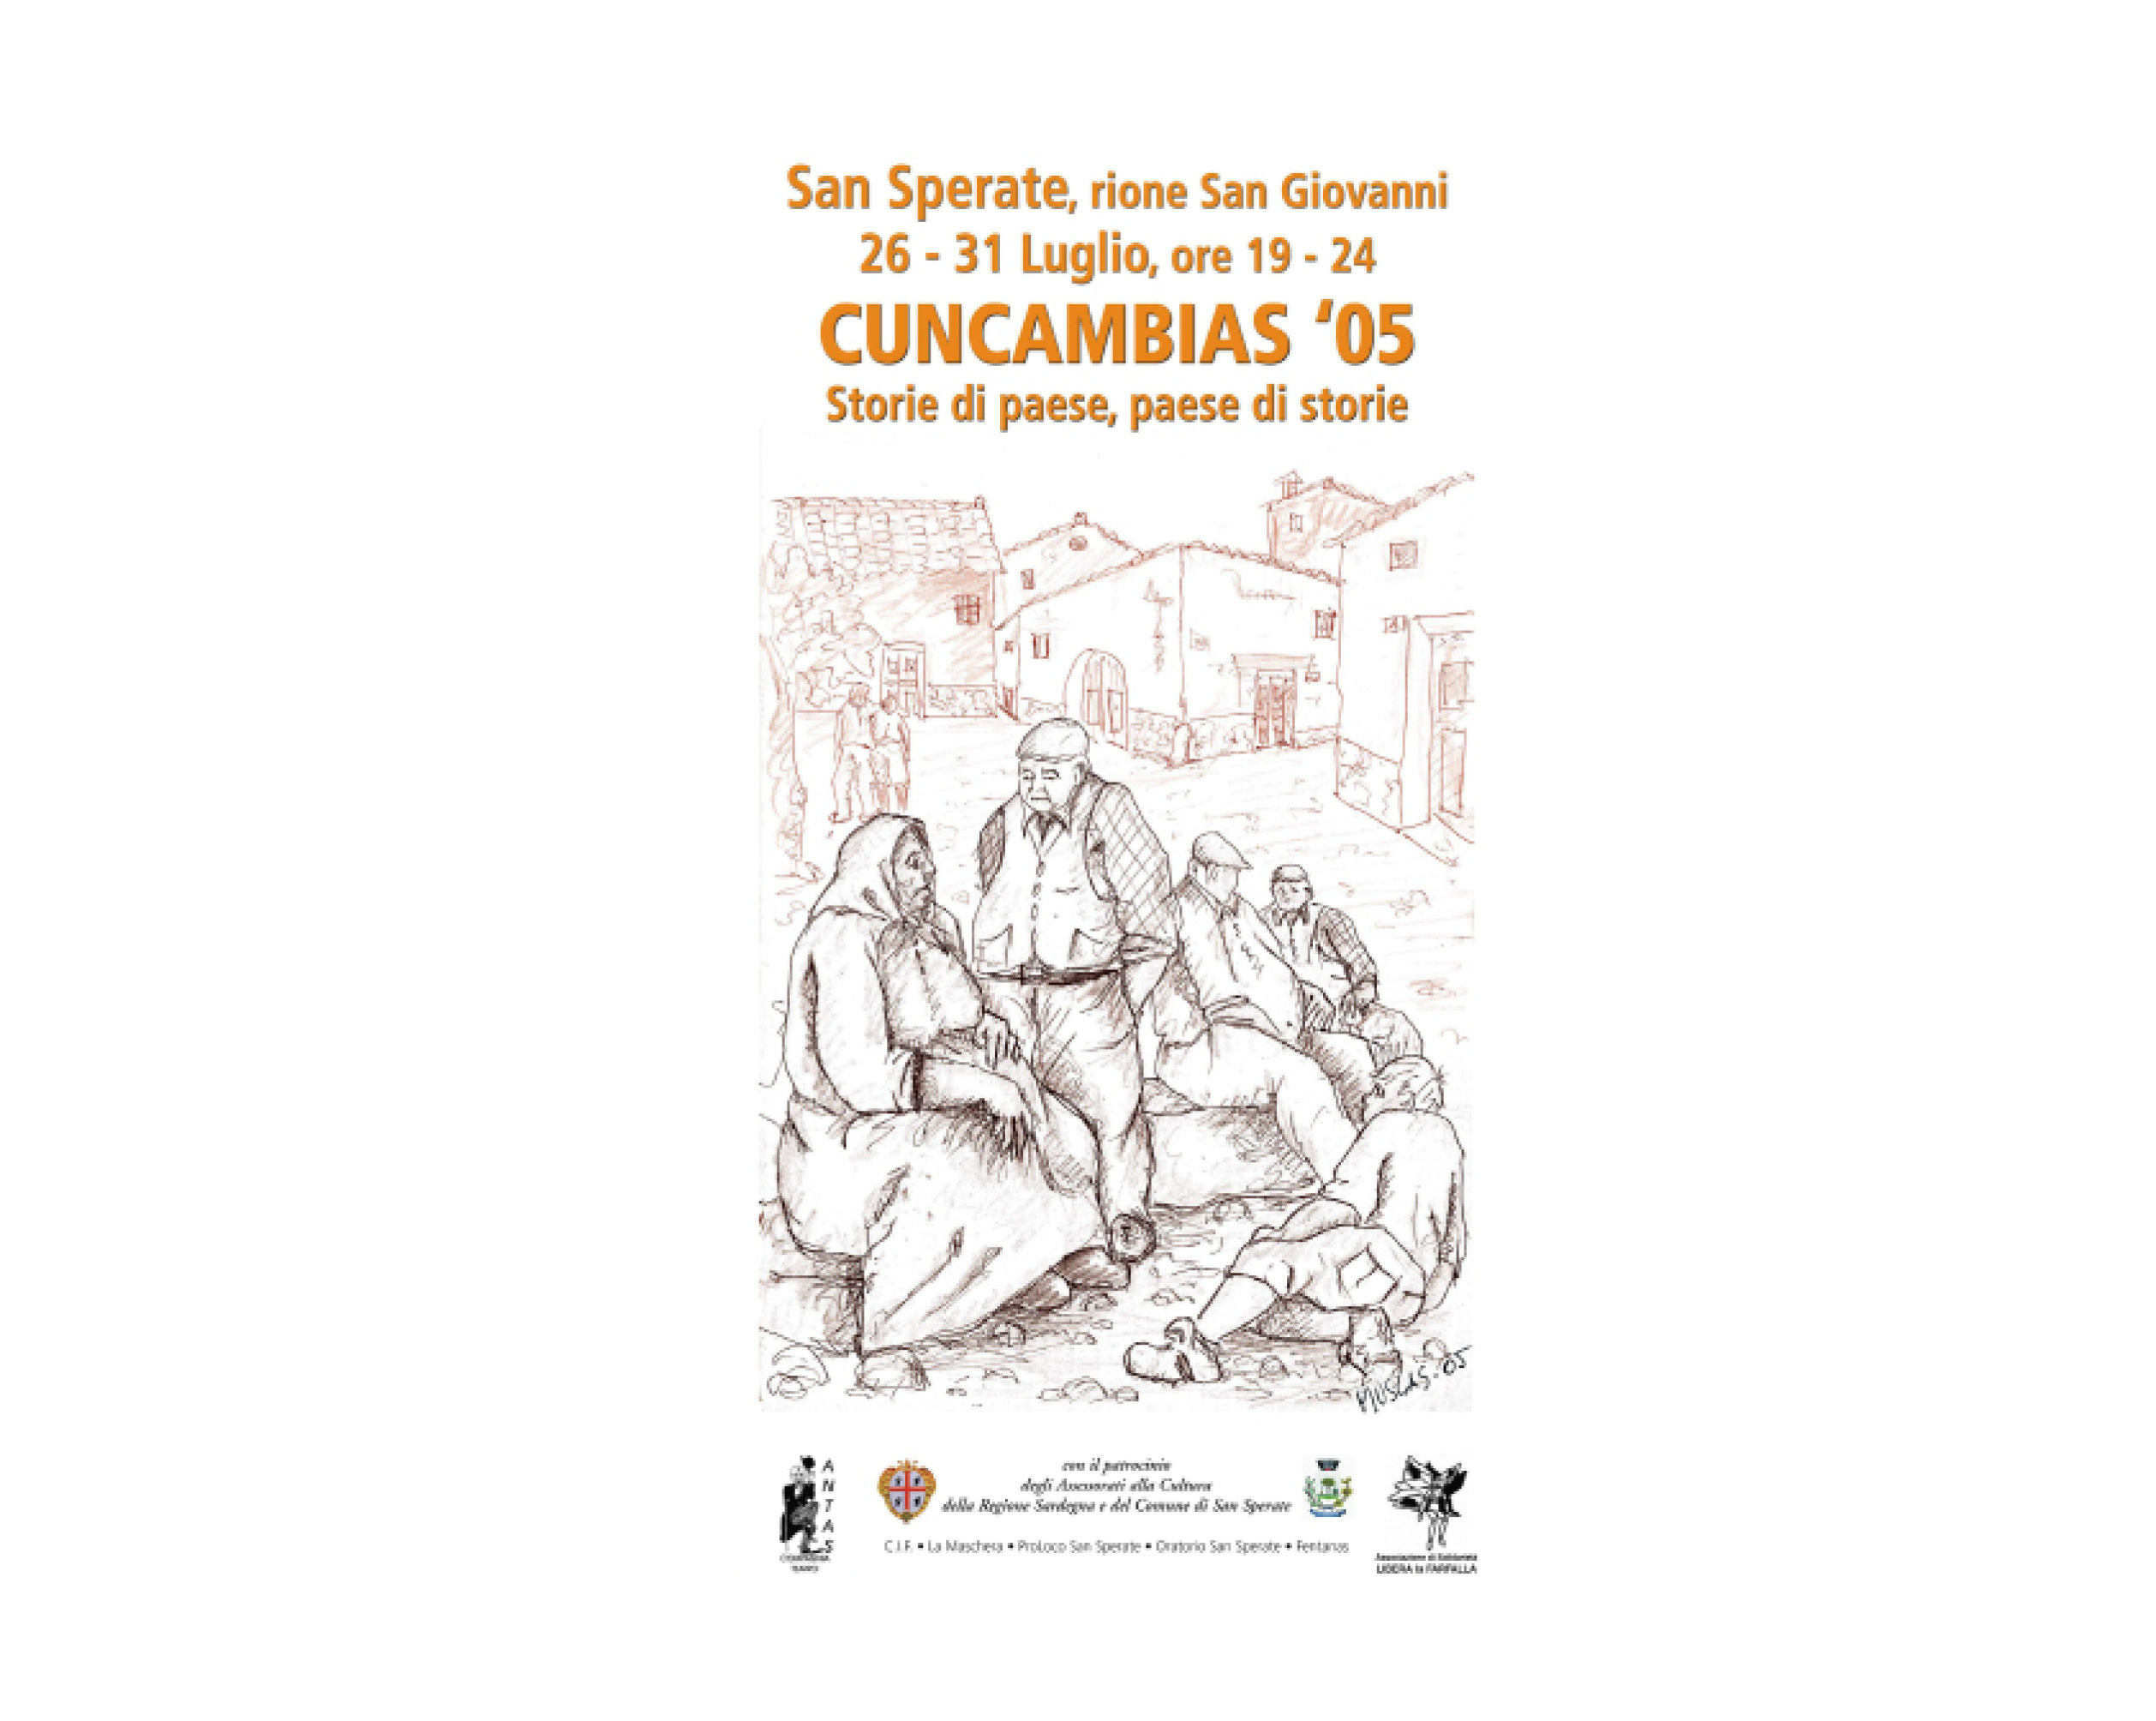 Cuncambias 2005